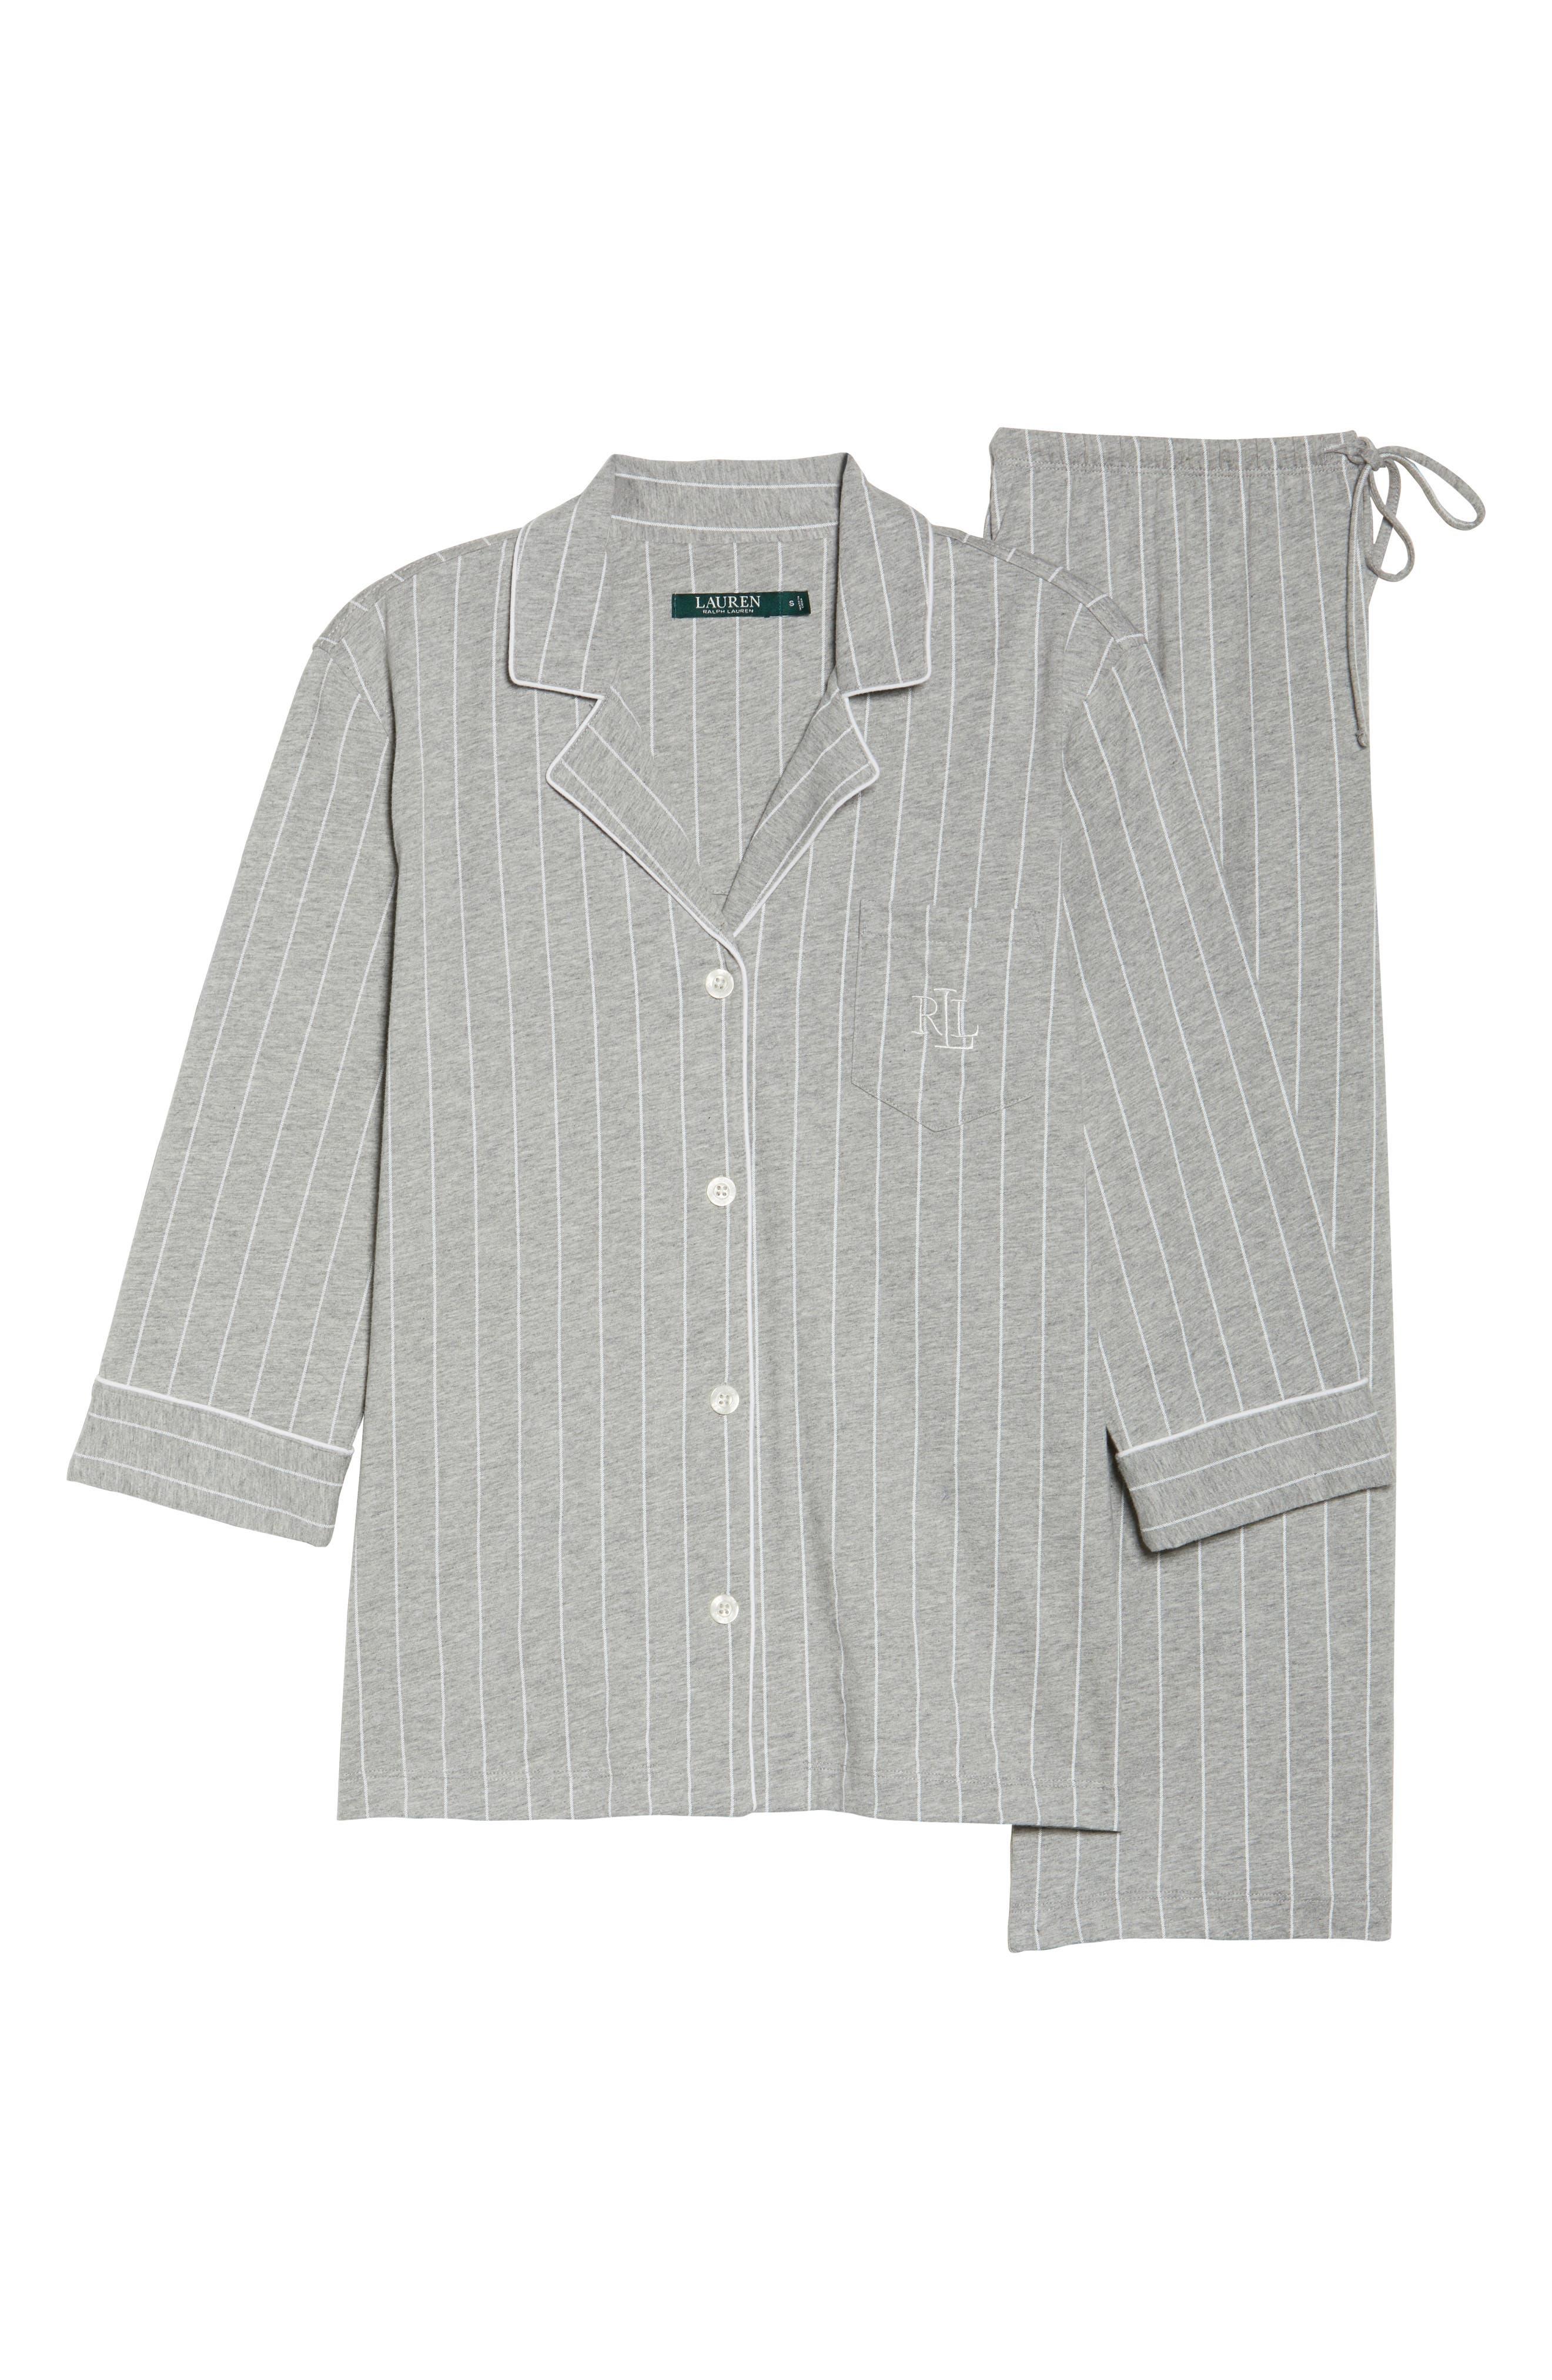 LAUREN RALPH LAUREN, Knit Crop Pajamas, Alternate thumbnail 6, color, GREYSTONE